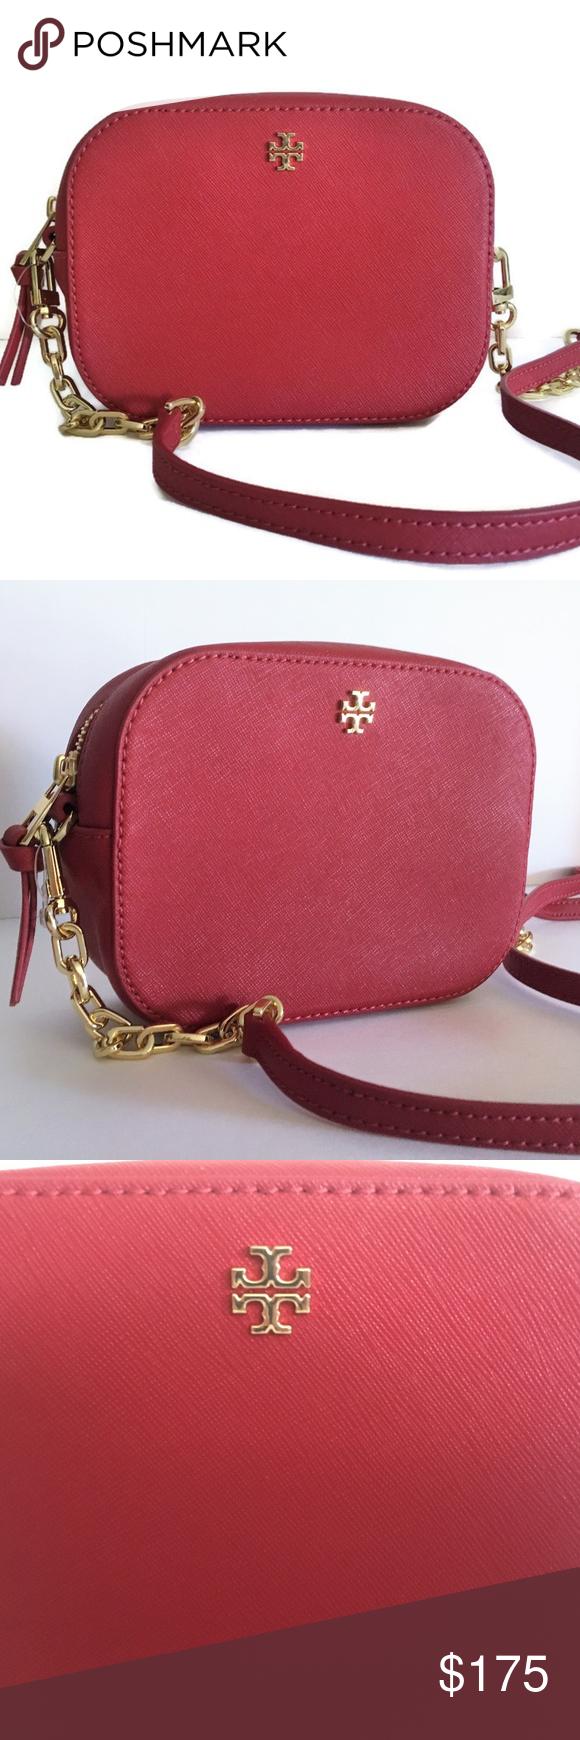 e38f854ed85 Tory Burch Emerson Round Crossbody - Red Handbag This Emerson Round  Cross-Body from Tory